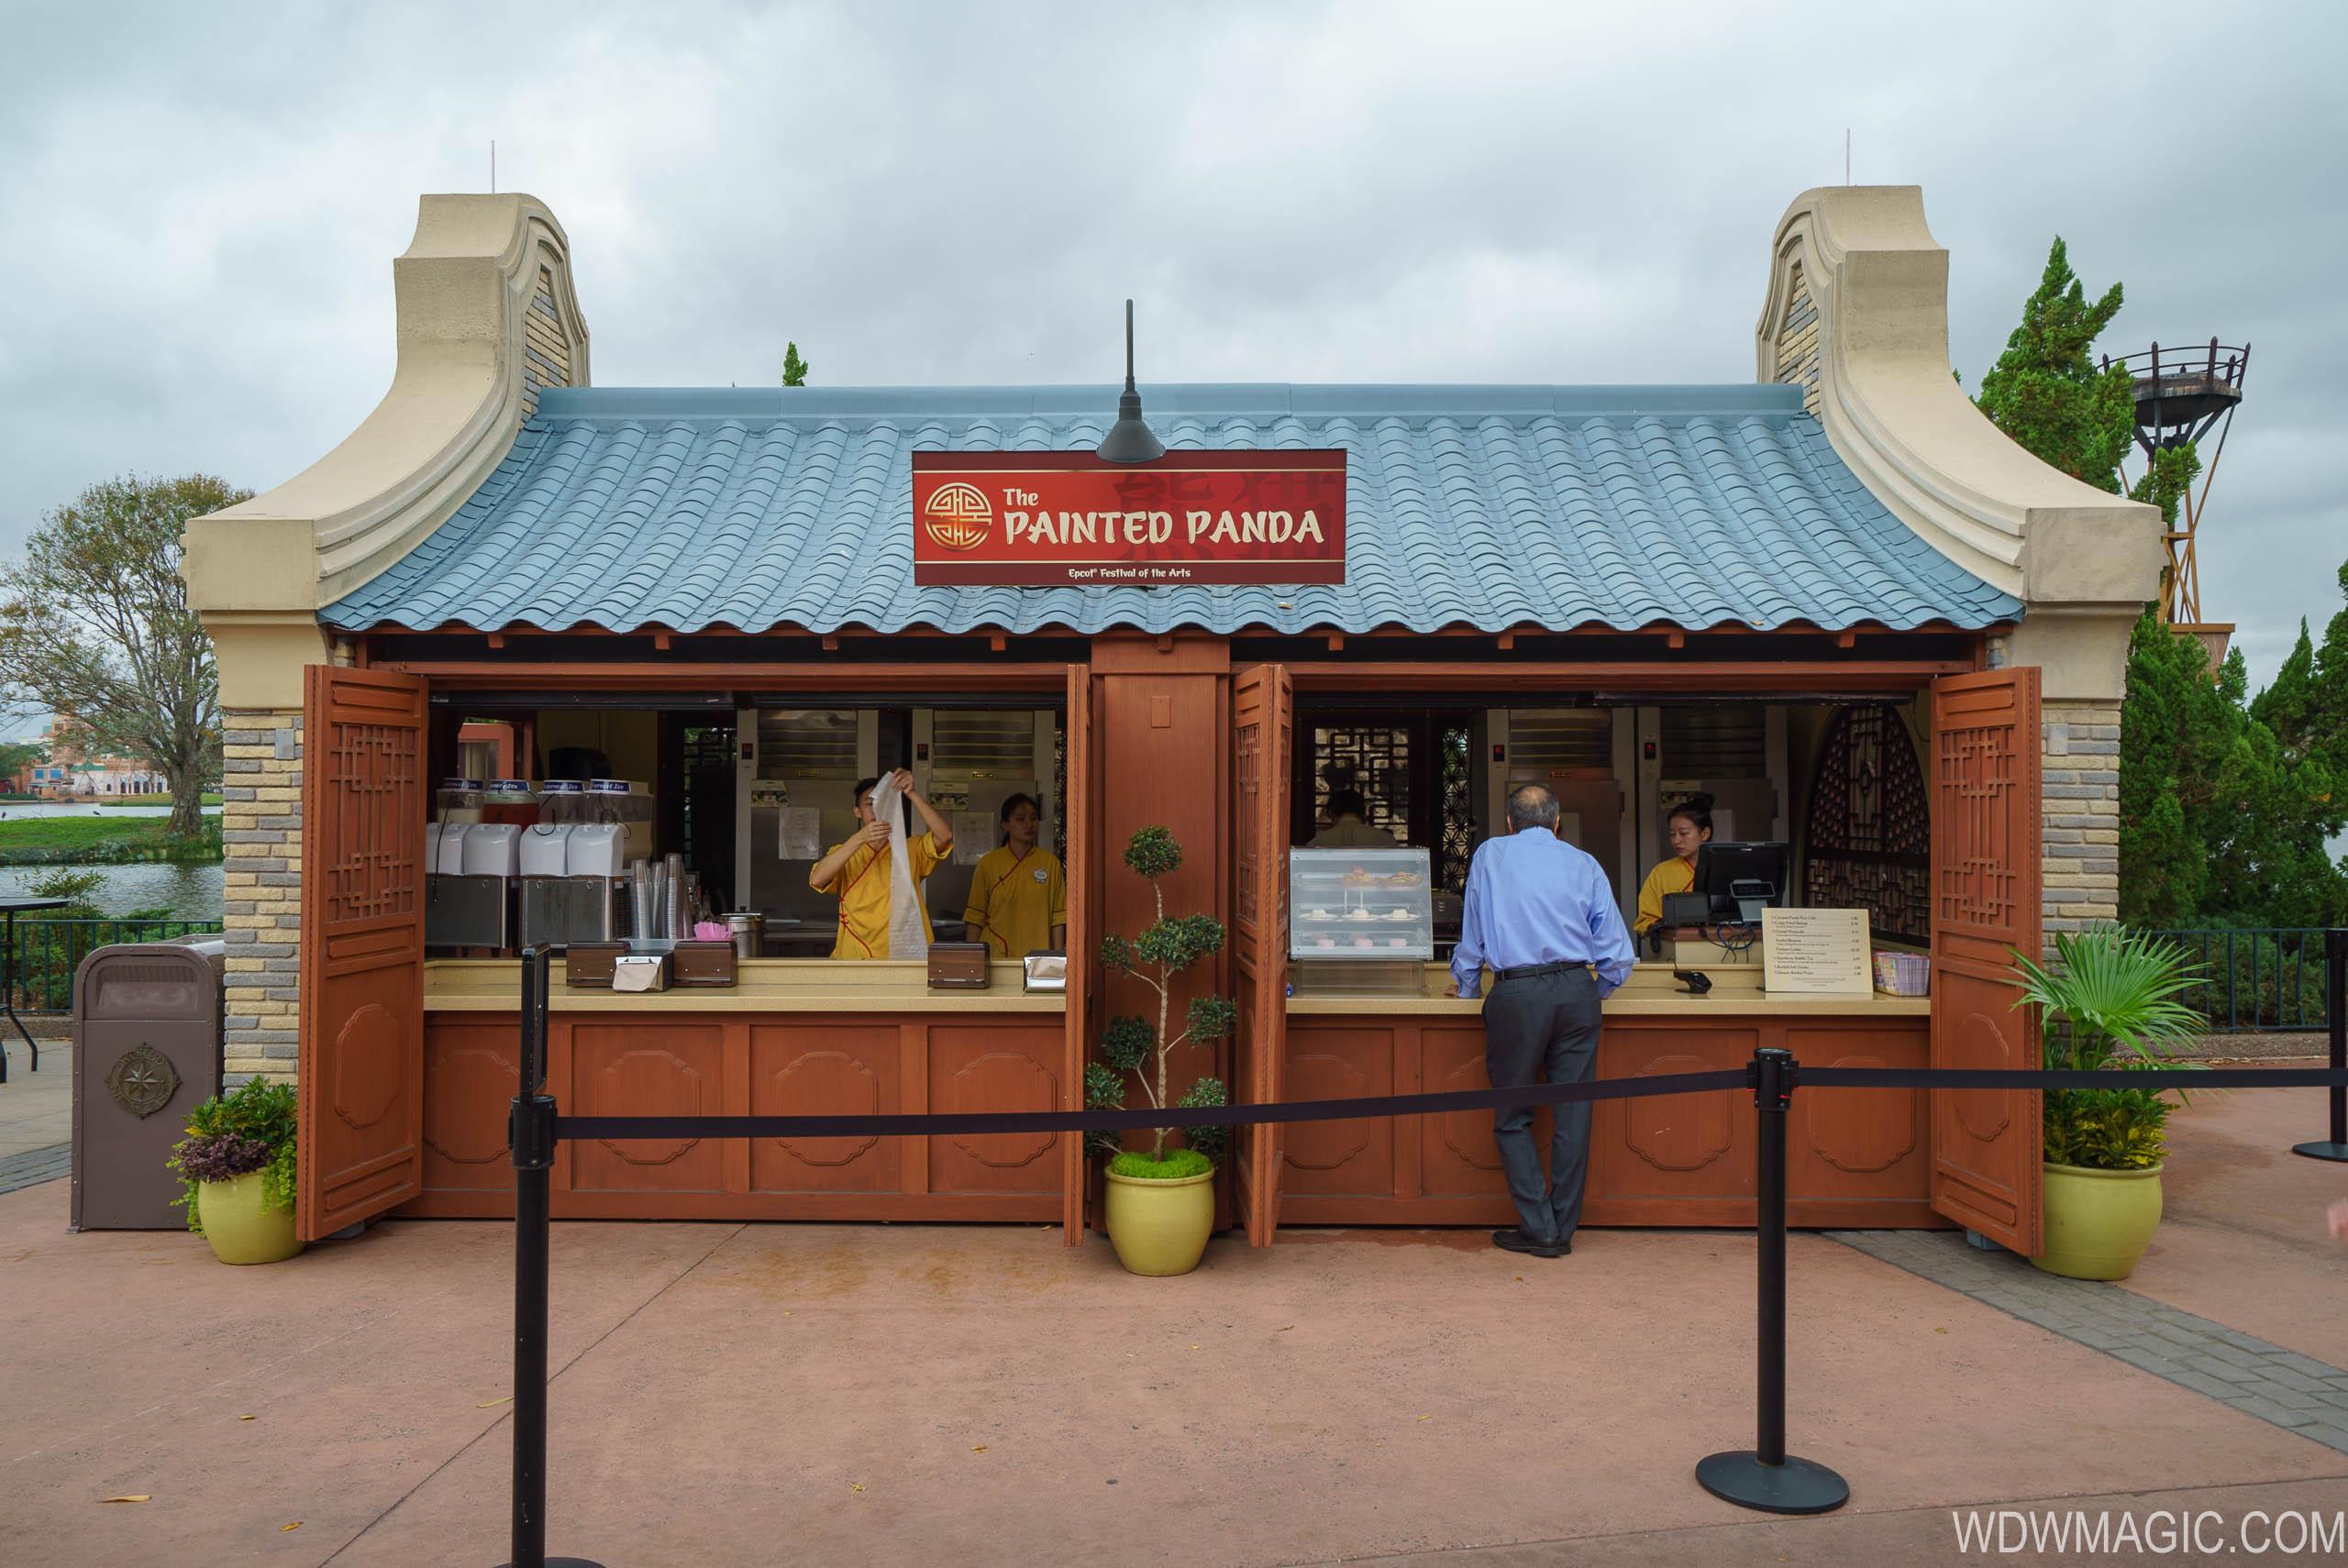 2018 Epcot Festival Of The Arts Food Studio Kiosks And Menus Photo 23 Of 26